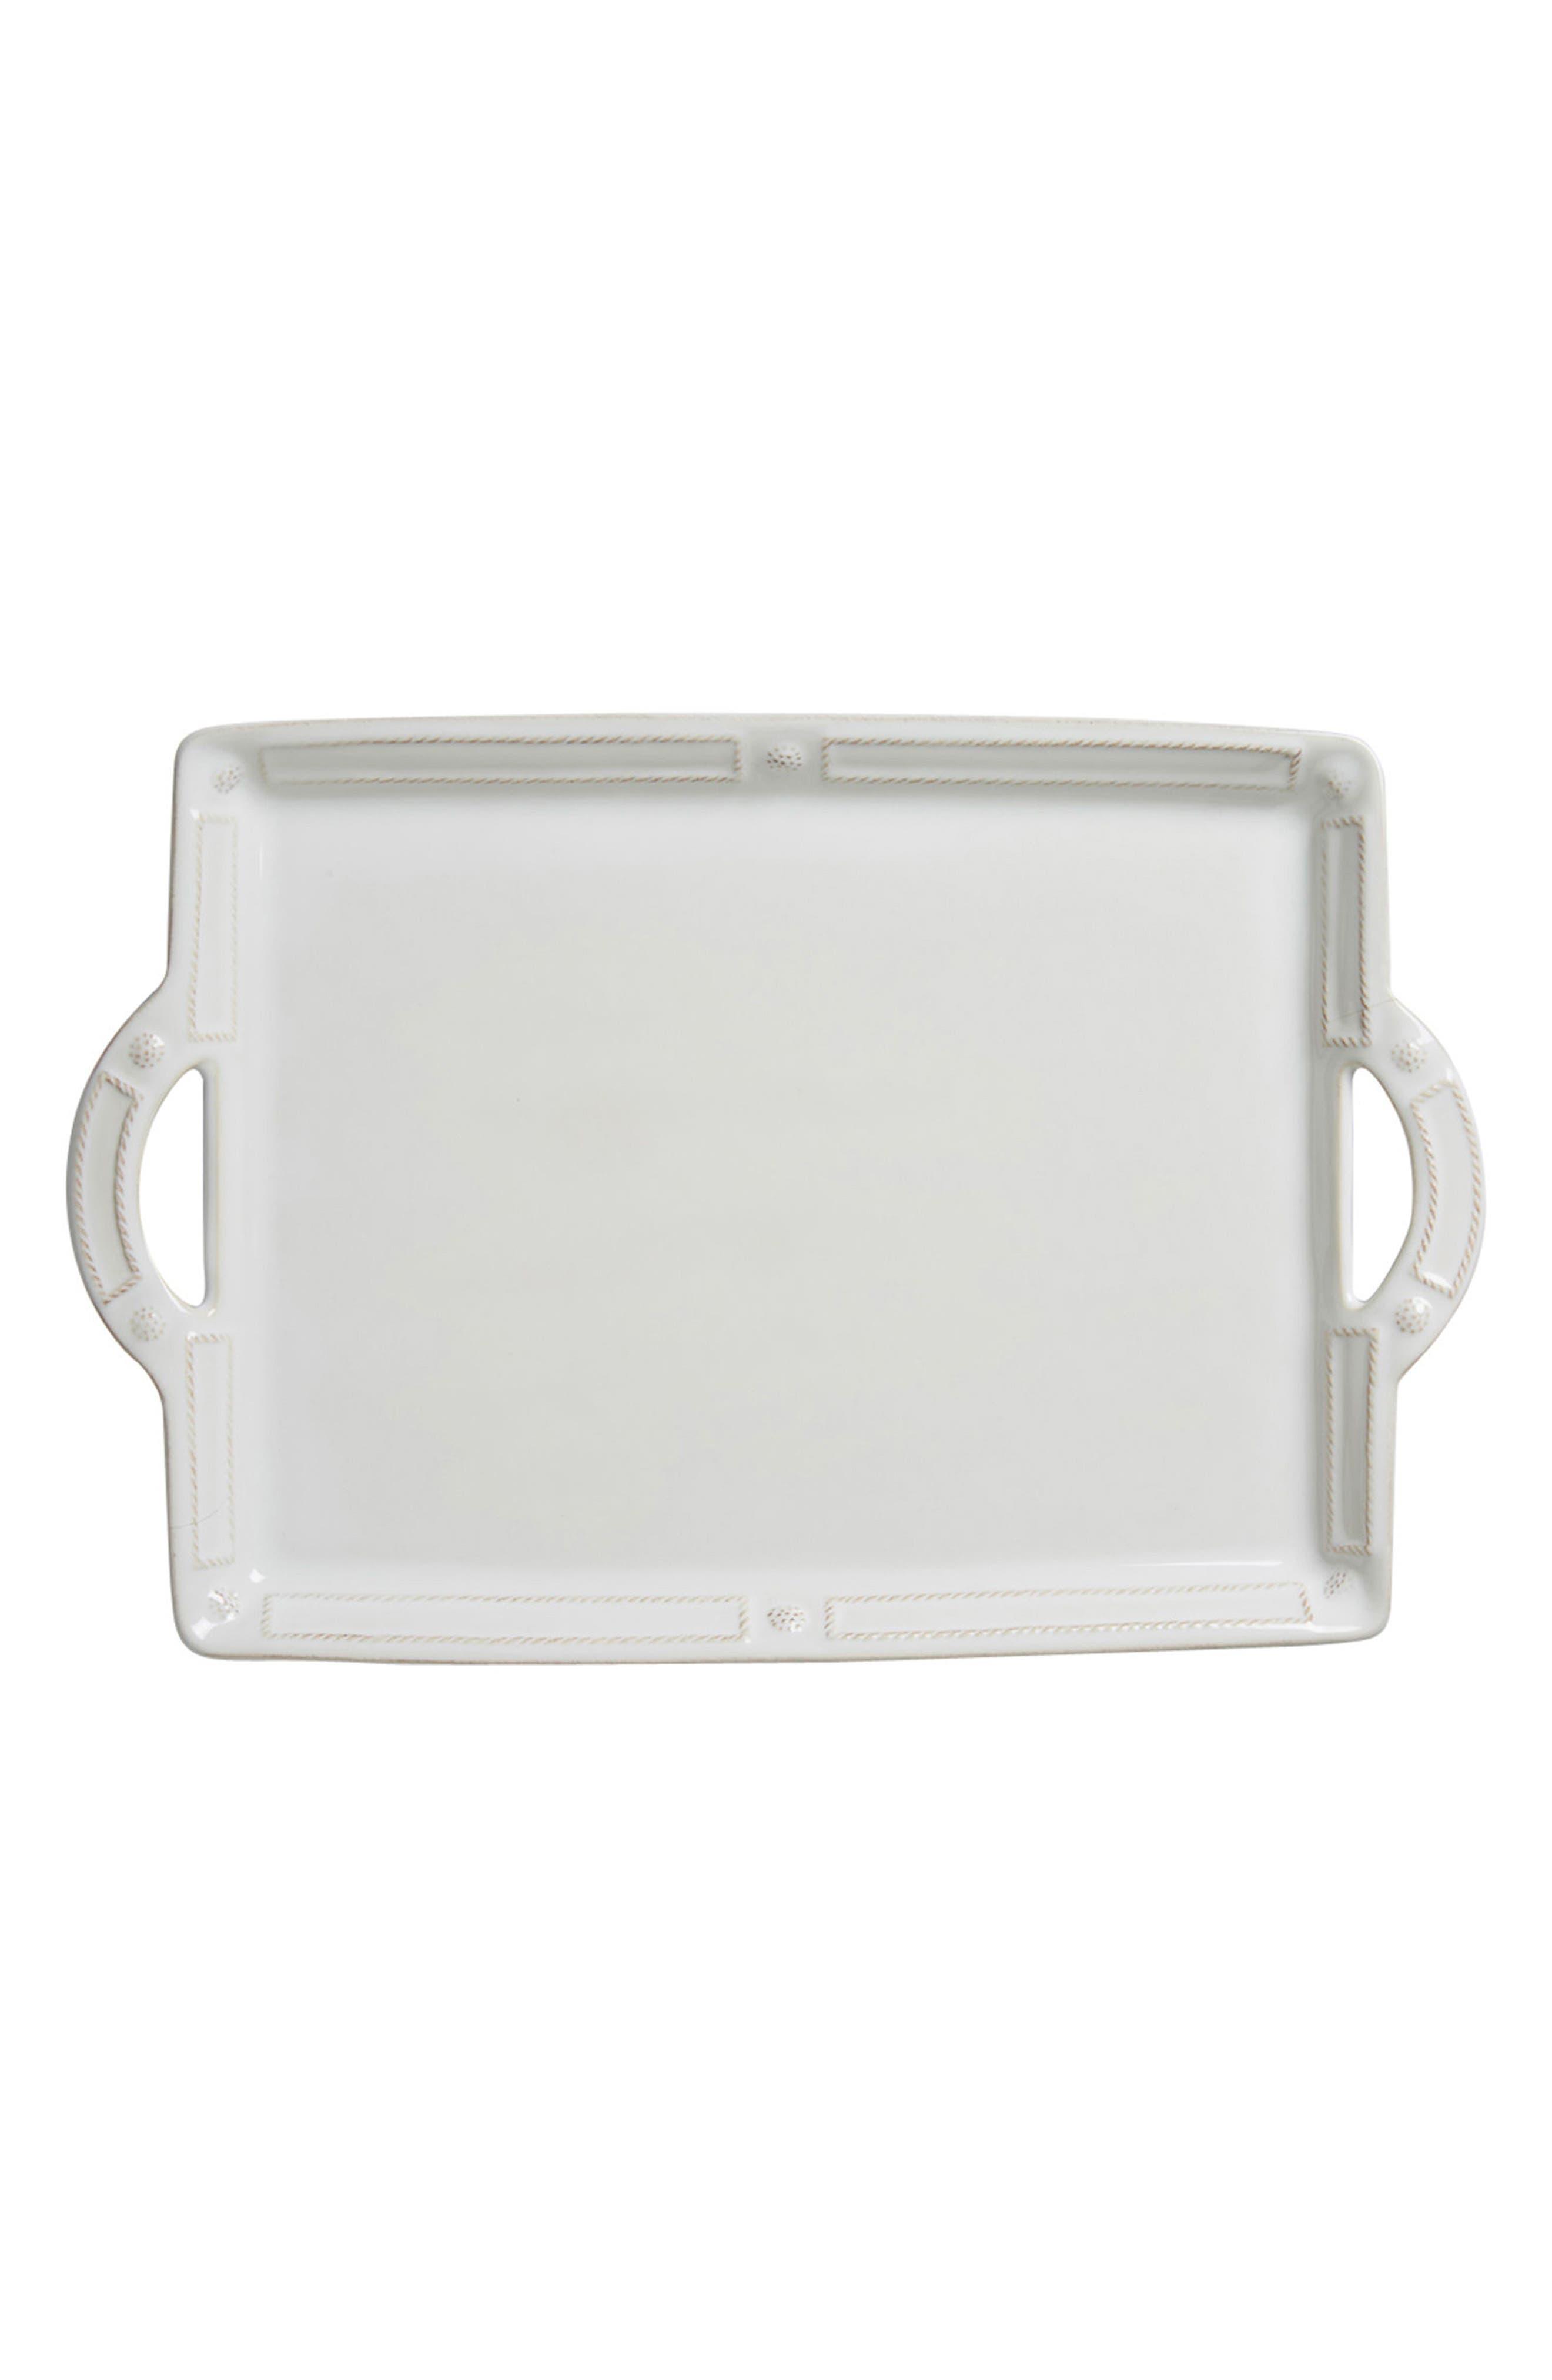 Berry & Thread Ceramic Tray,                         Main,                         color, WHITEWASH